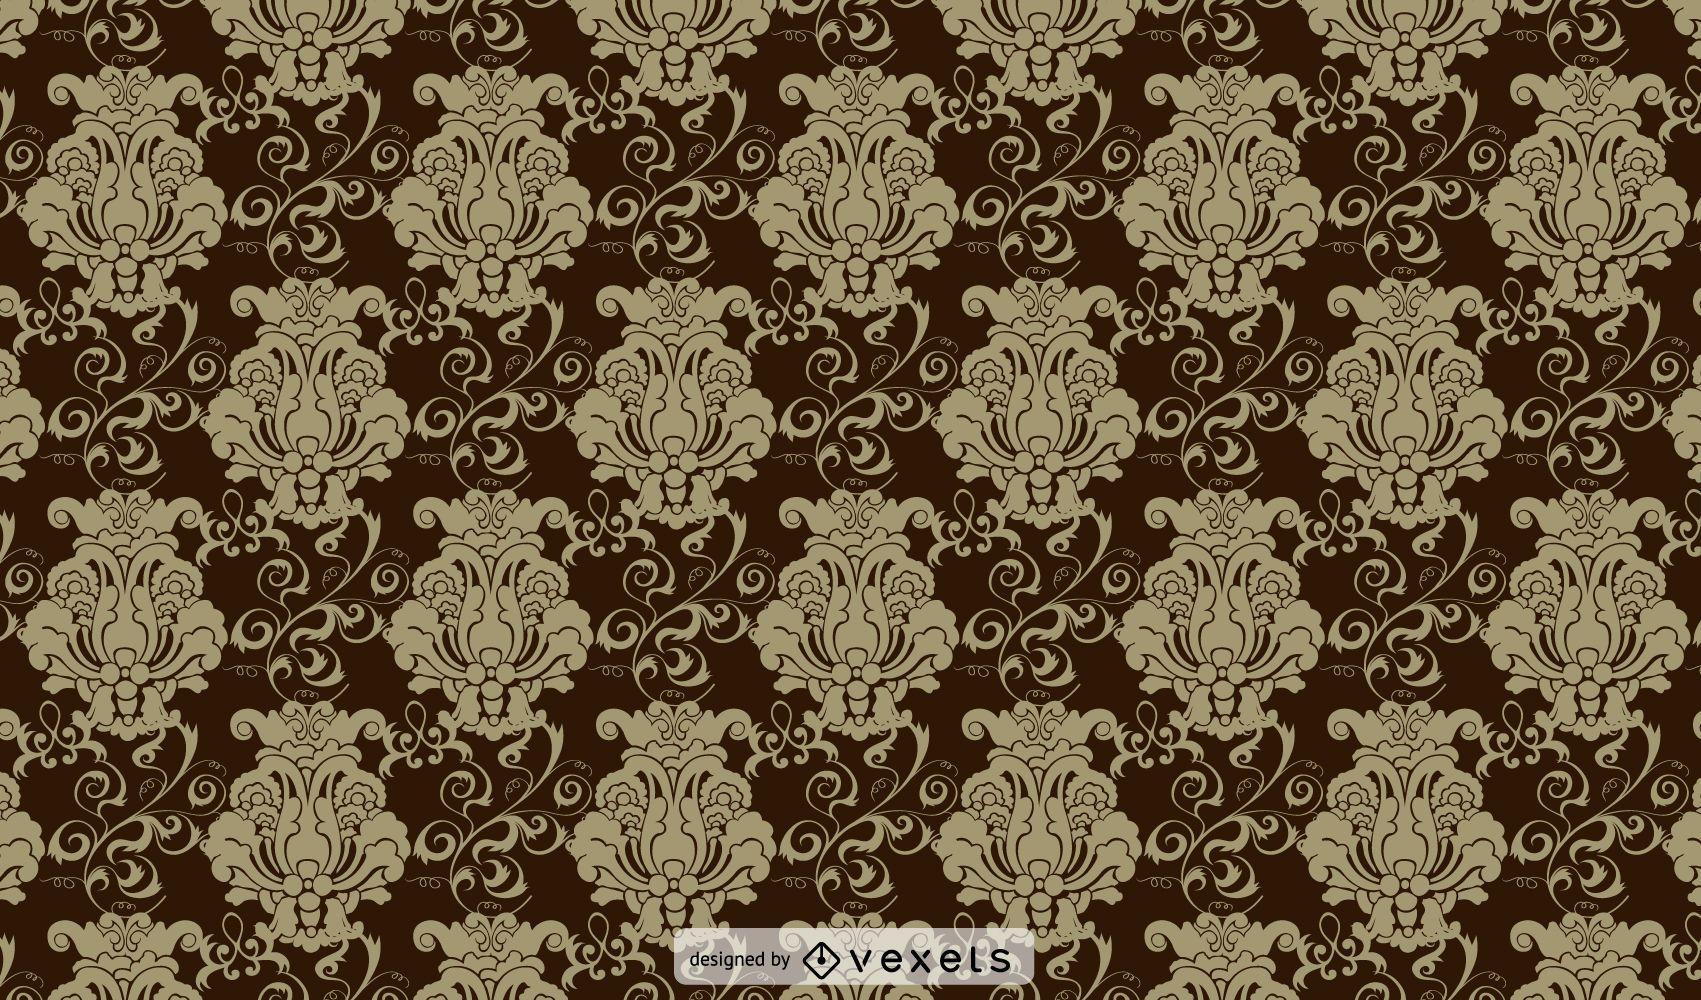 Brown Vintage Ornate Pattern Background